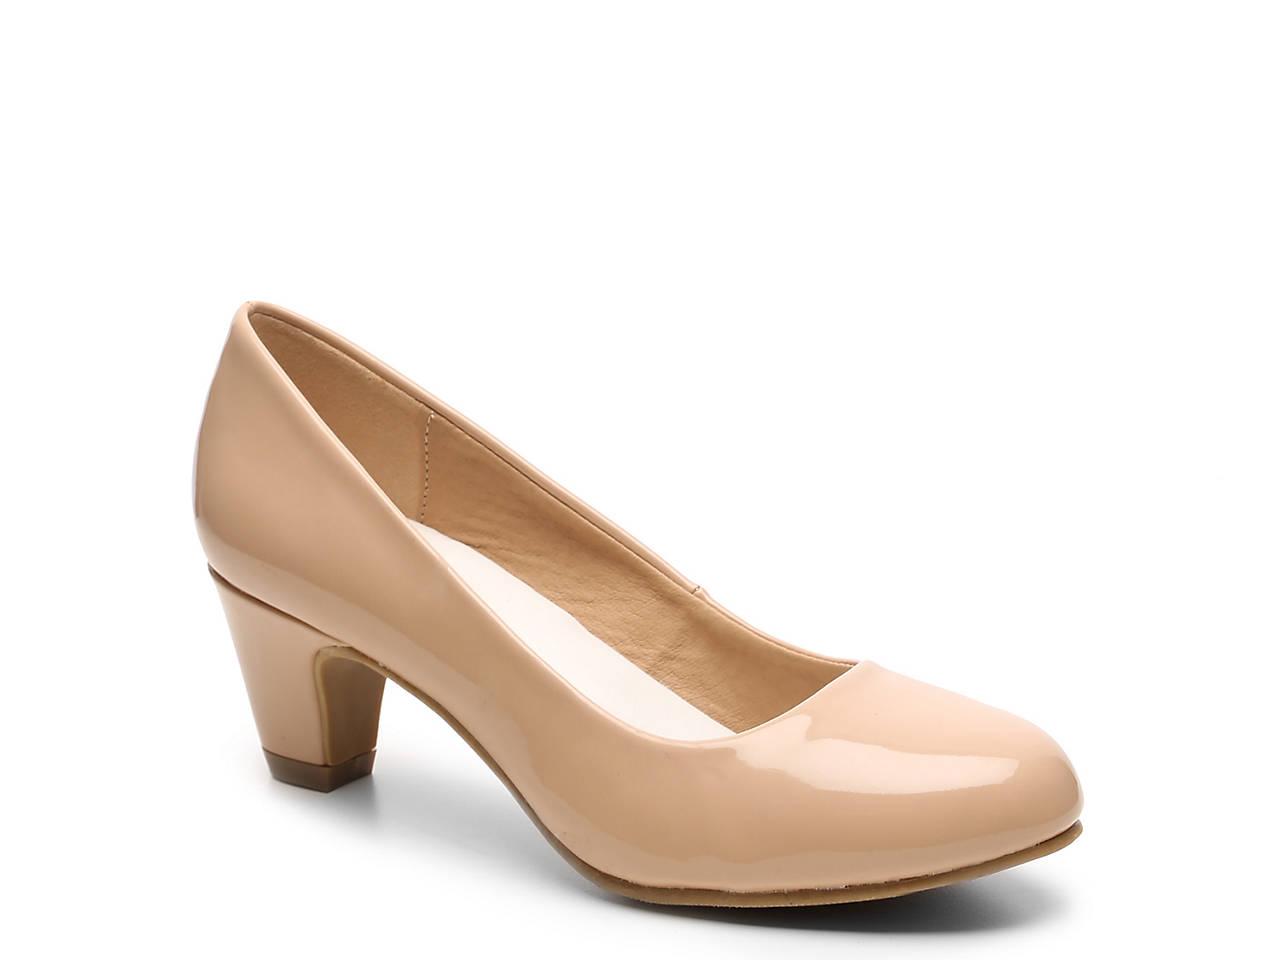 9fd2afef3cb2 Journee Collection Luu Pump Women s Shoes